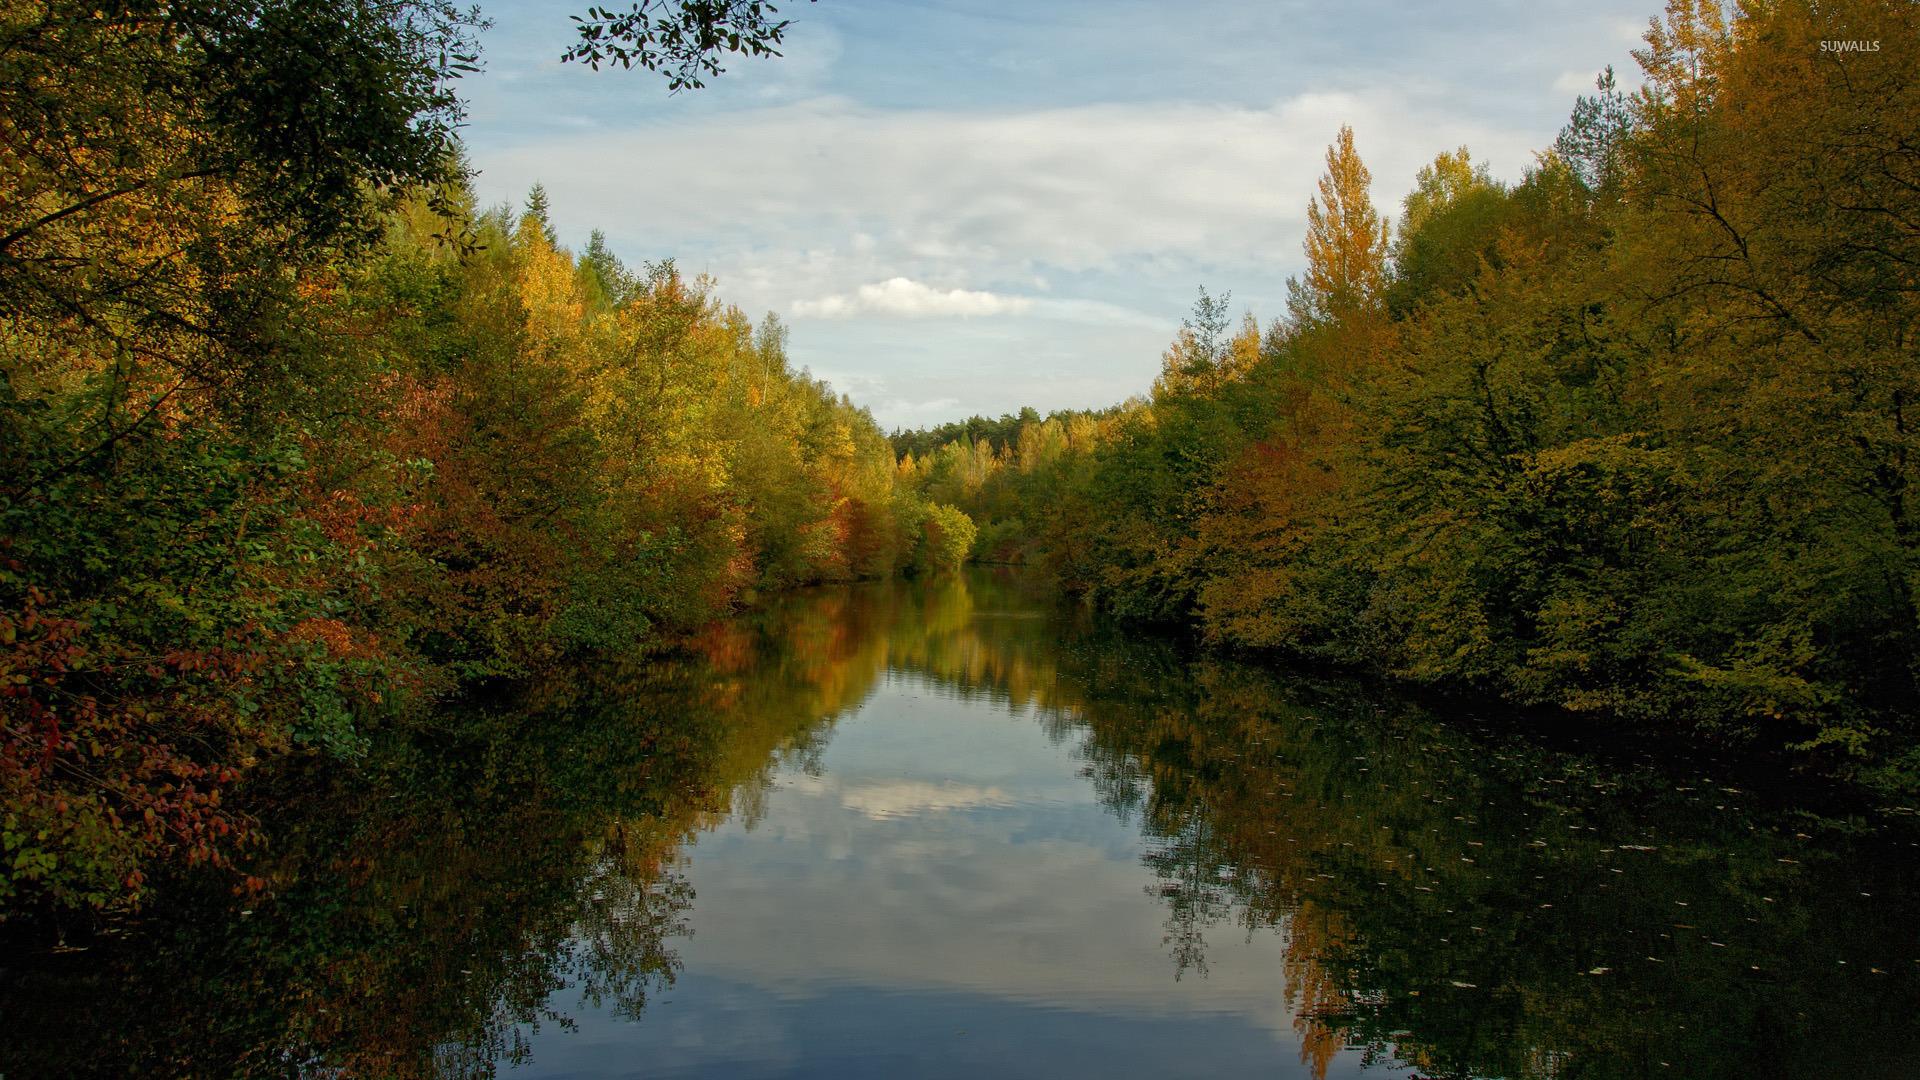 autumn nature river - photo #46